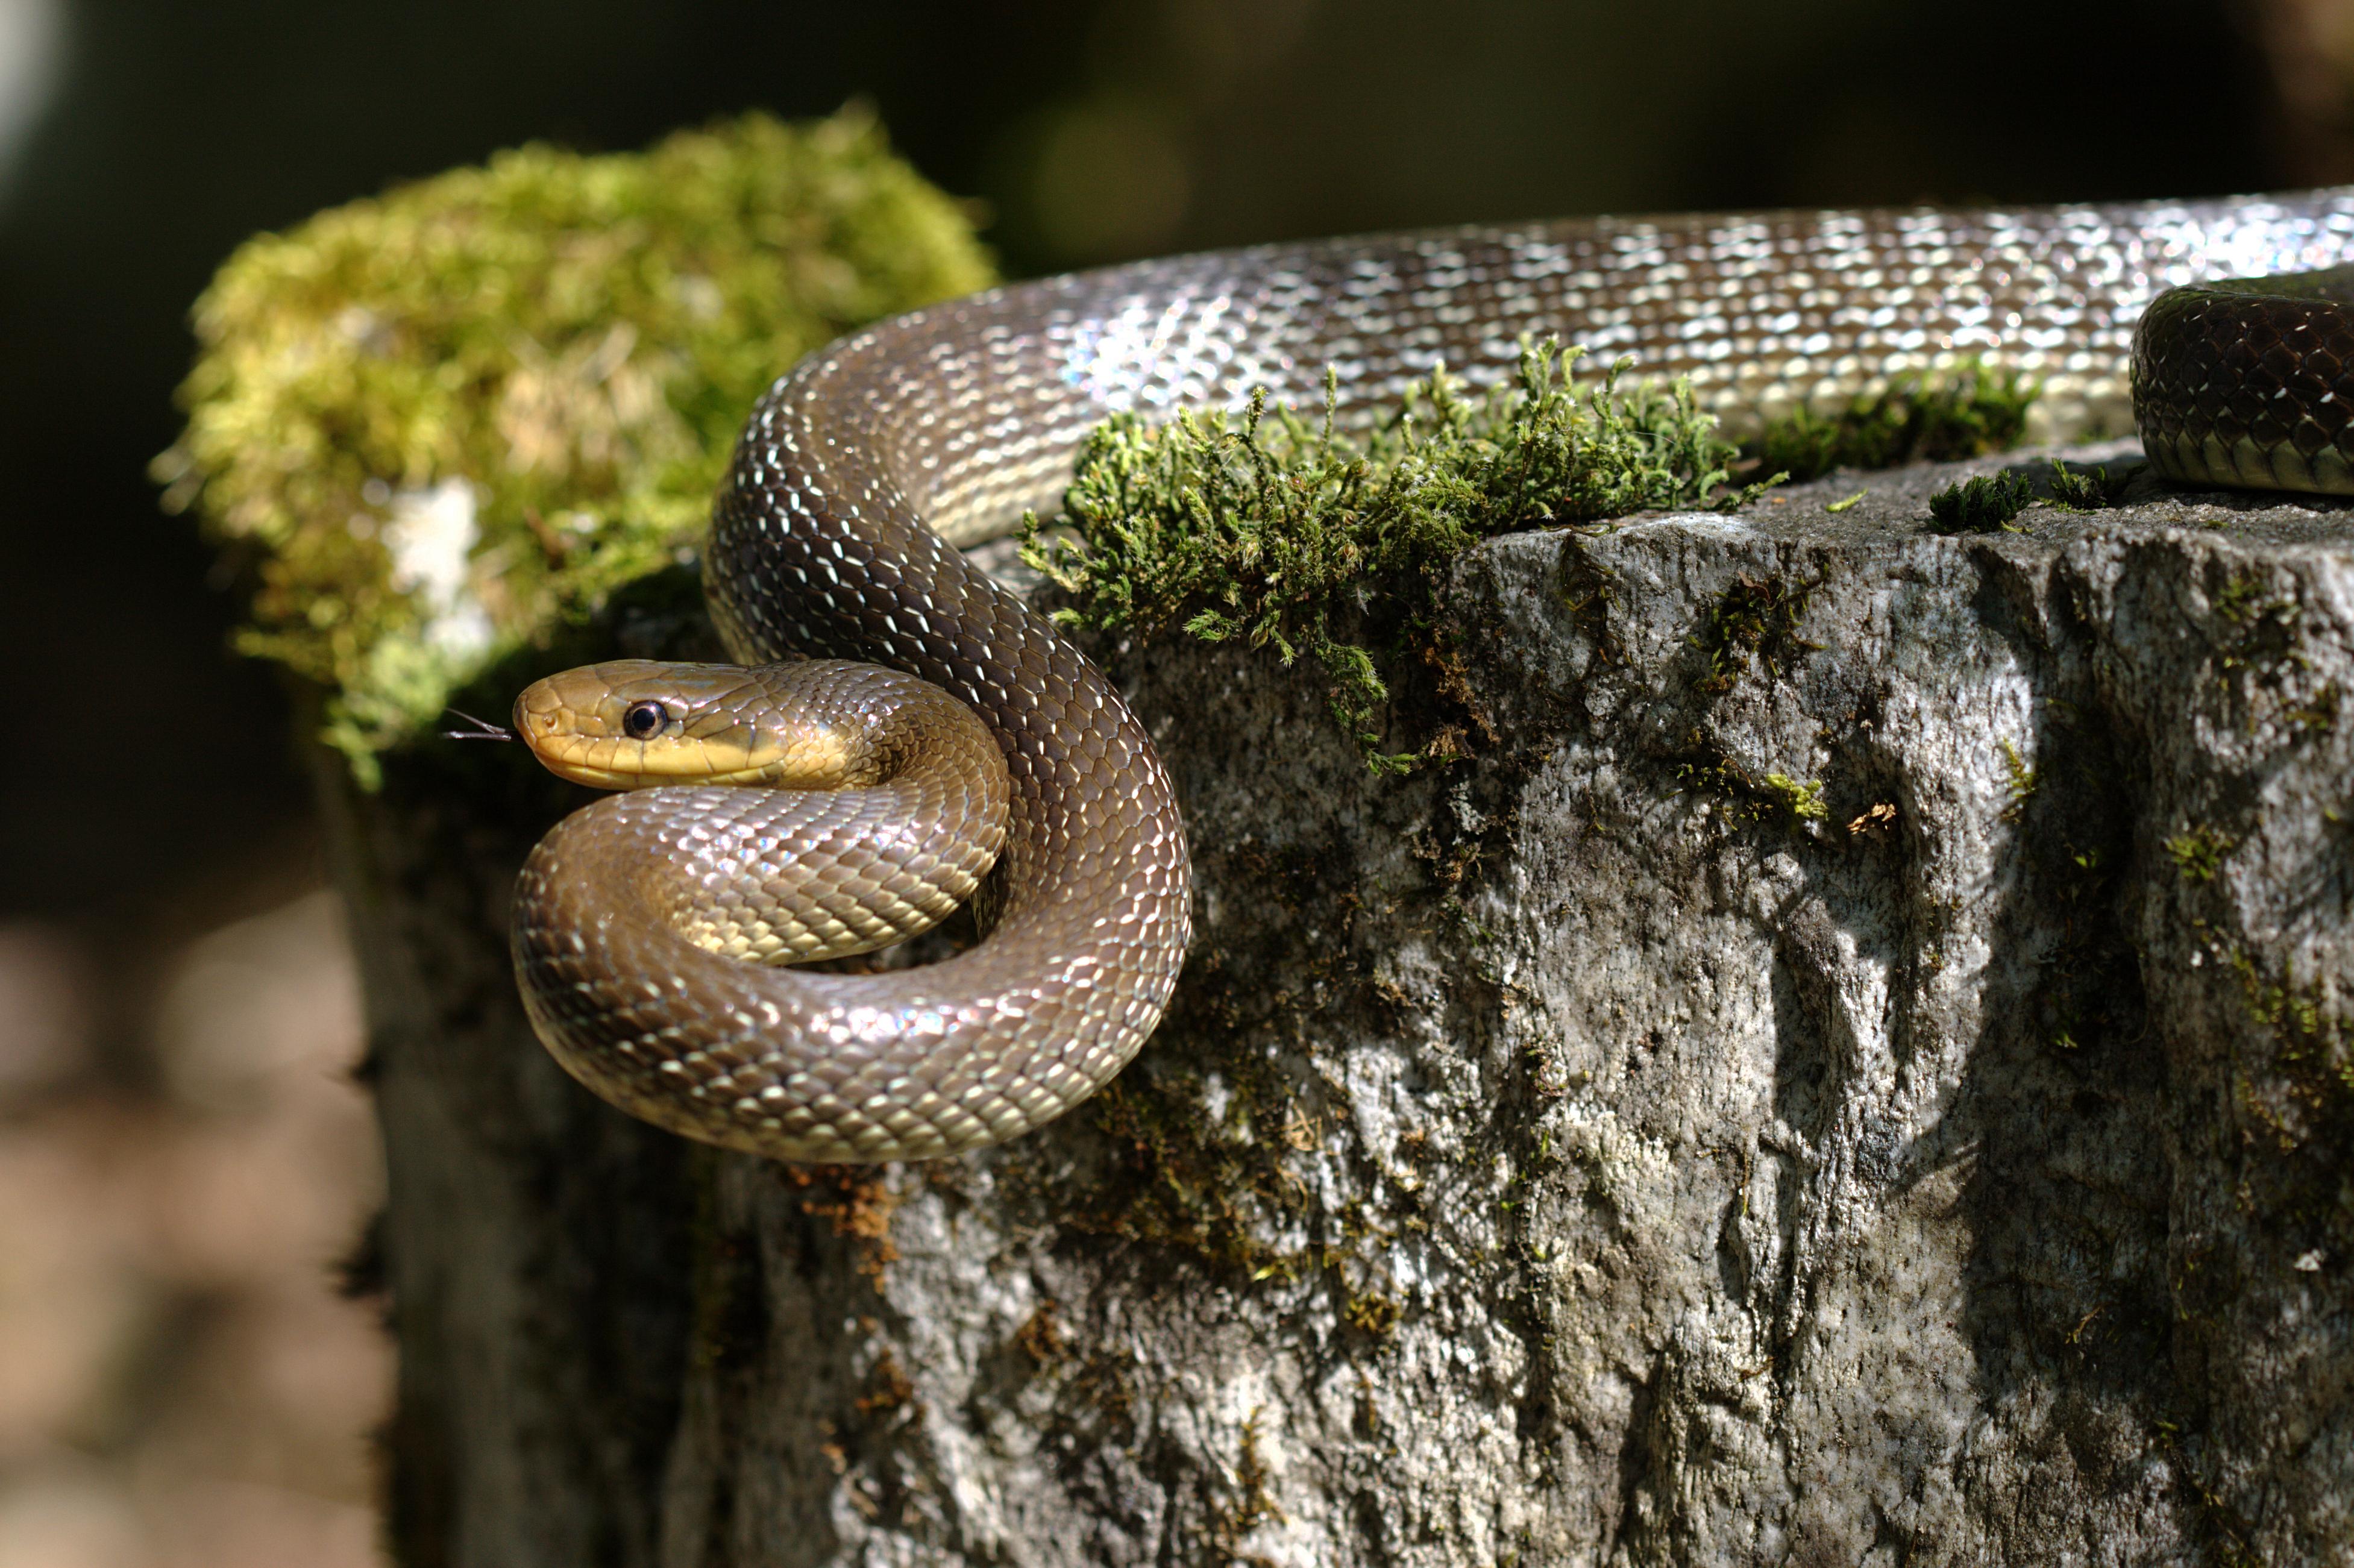 Член в виде змеи 23 фотография